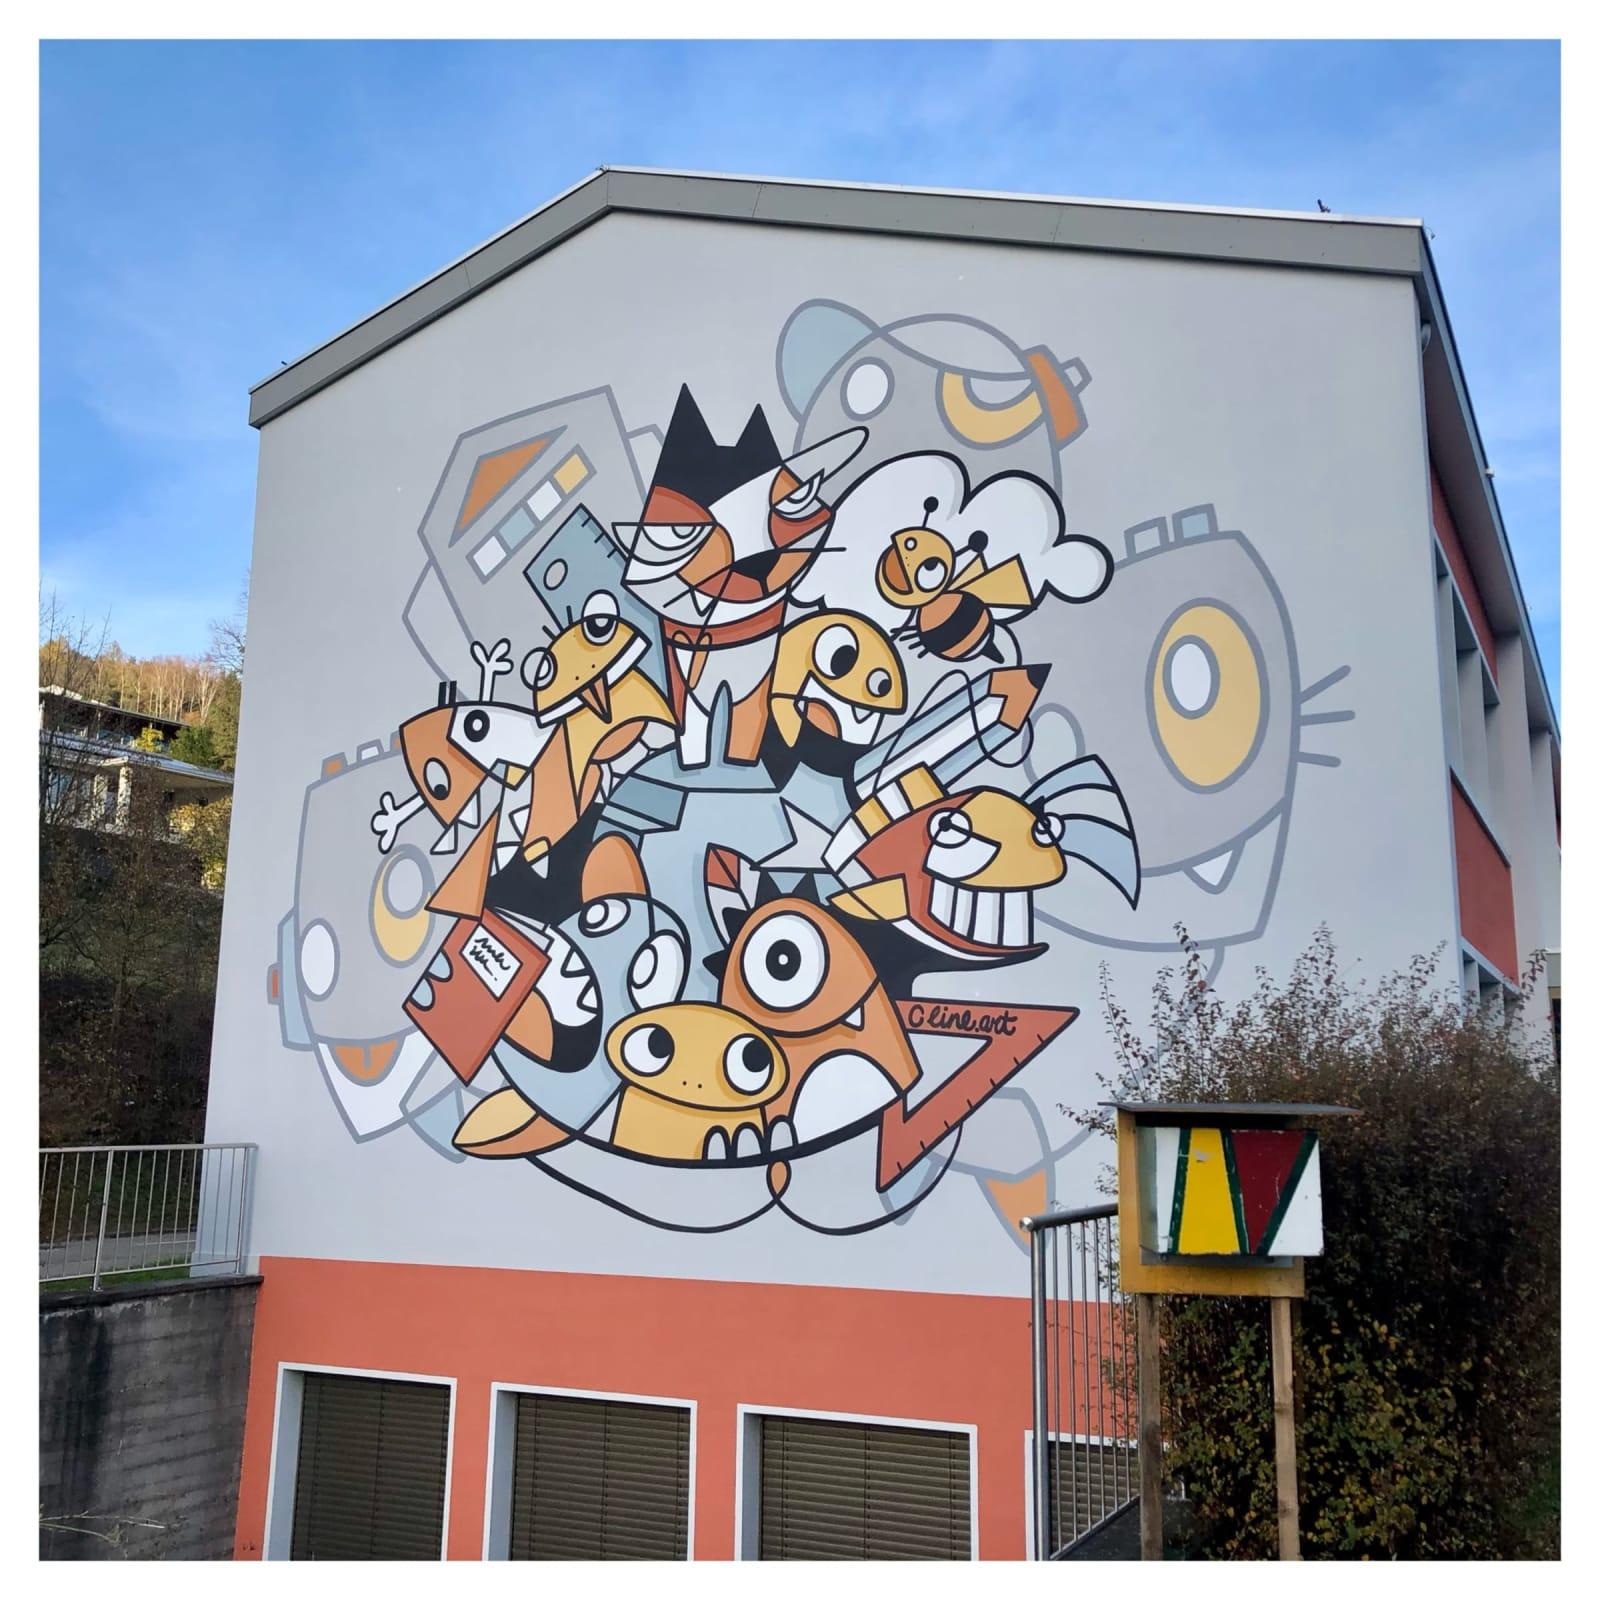 CELINE QUADRI | 2020 Primarschule, Grellingen AUFTRAGGEBER: Gemeinde Grellingen PRINCIPAL: community of grellingen